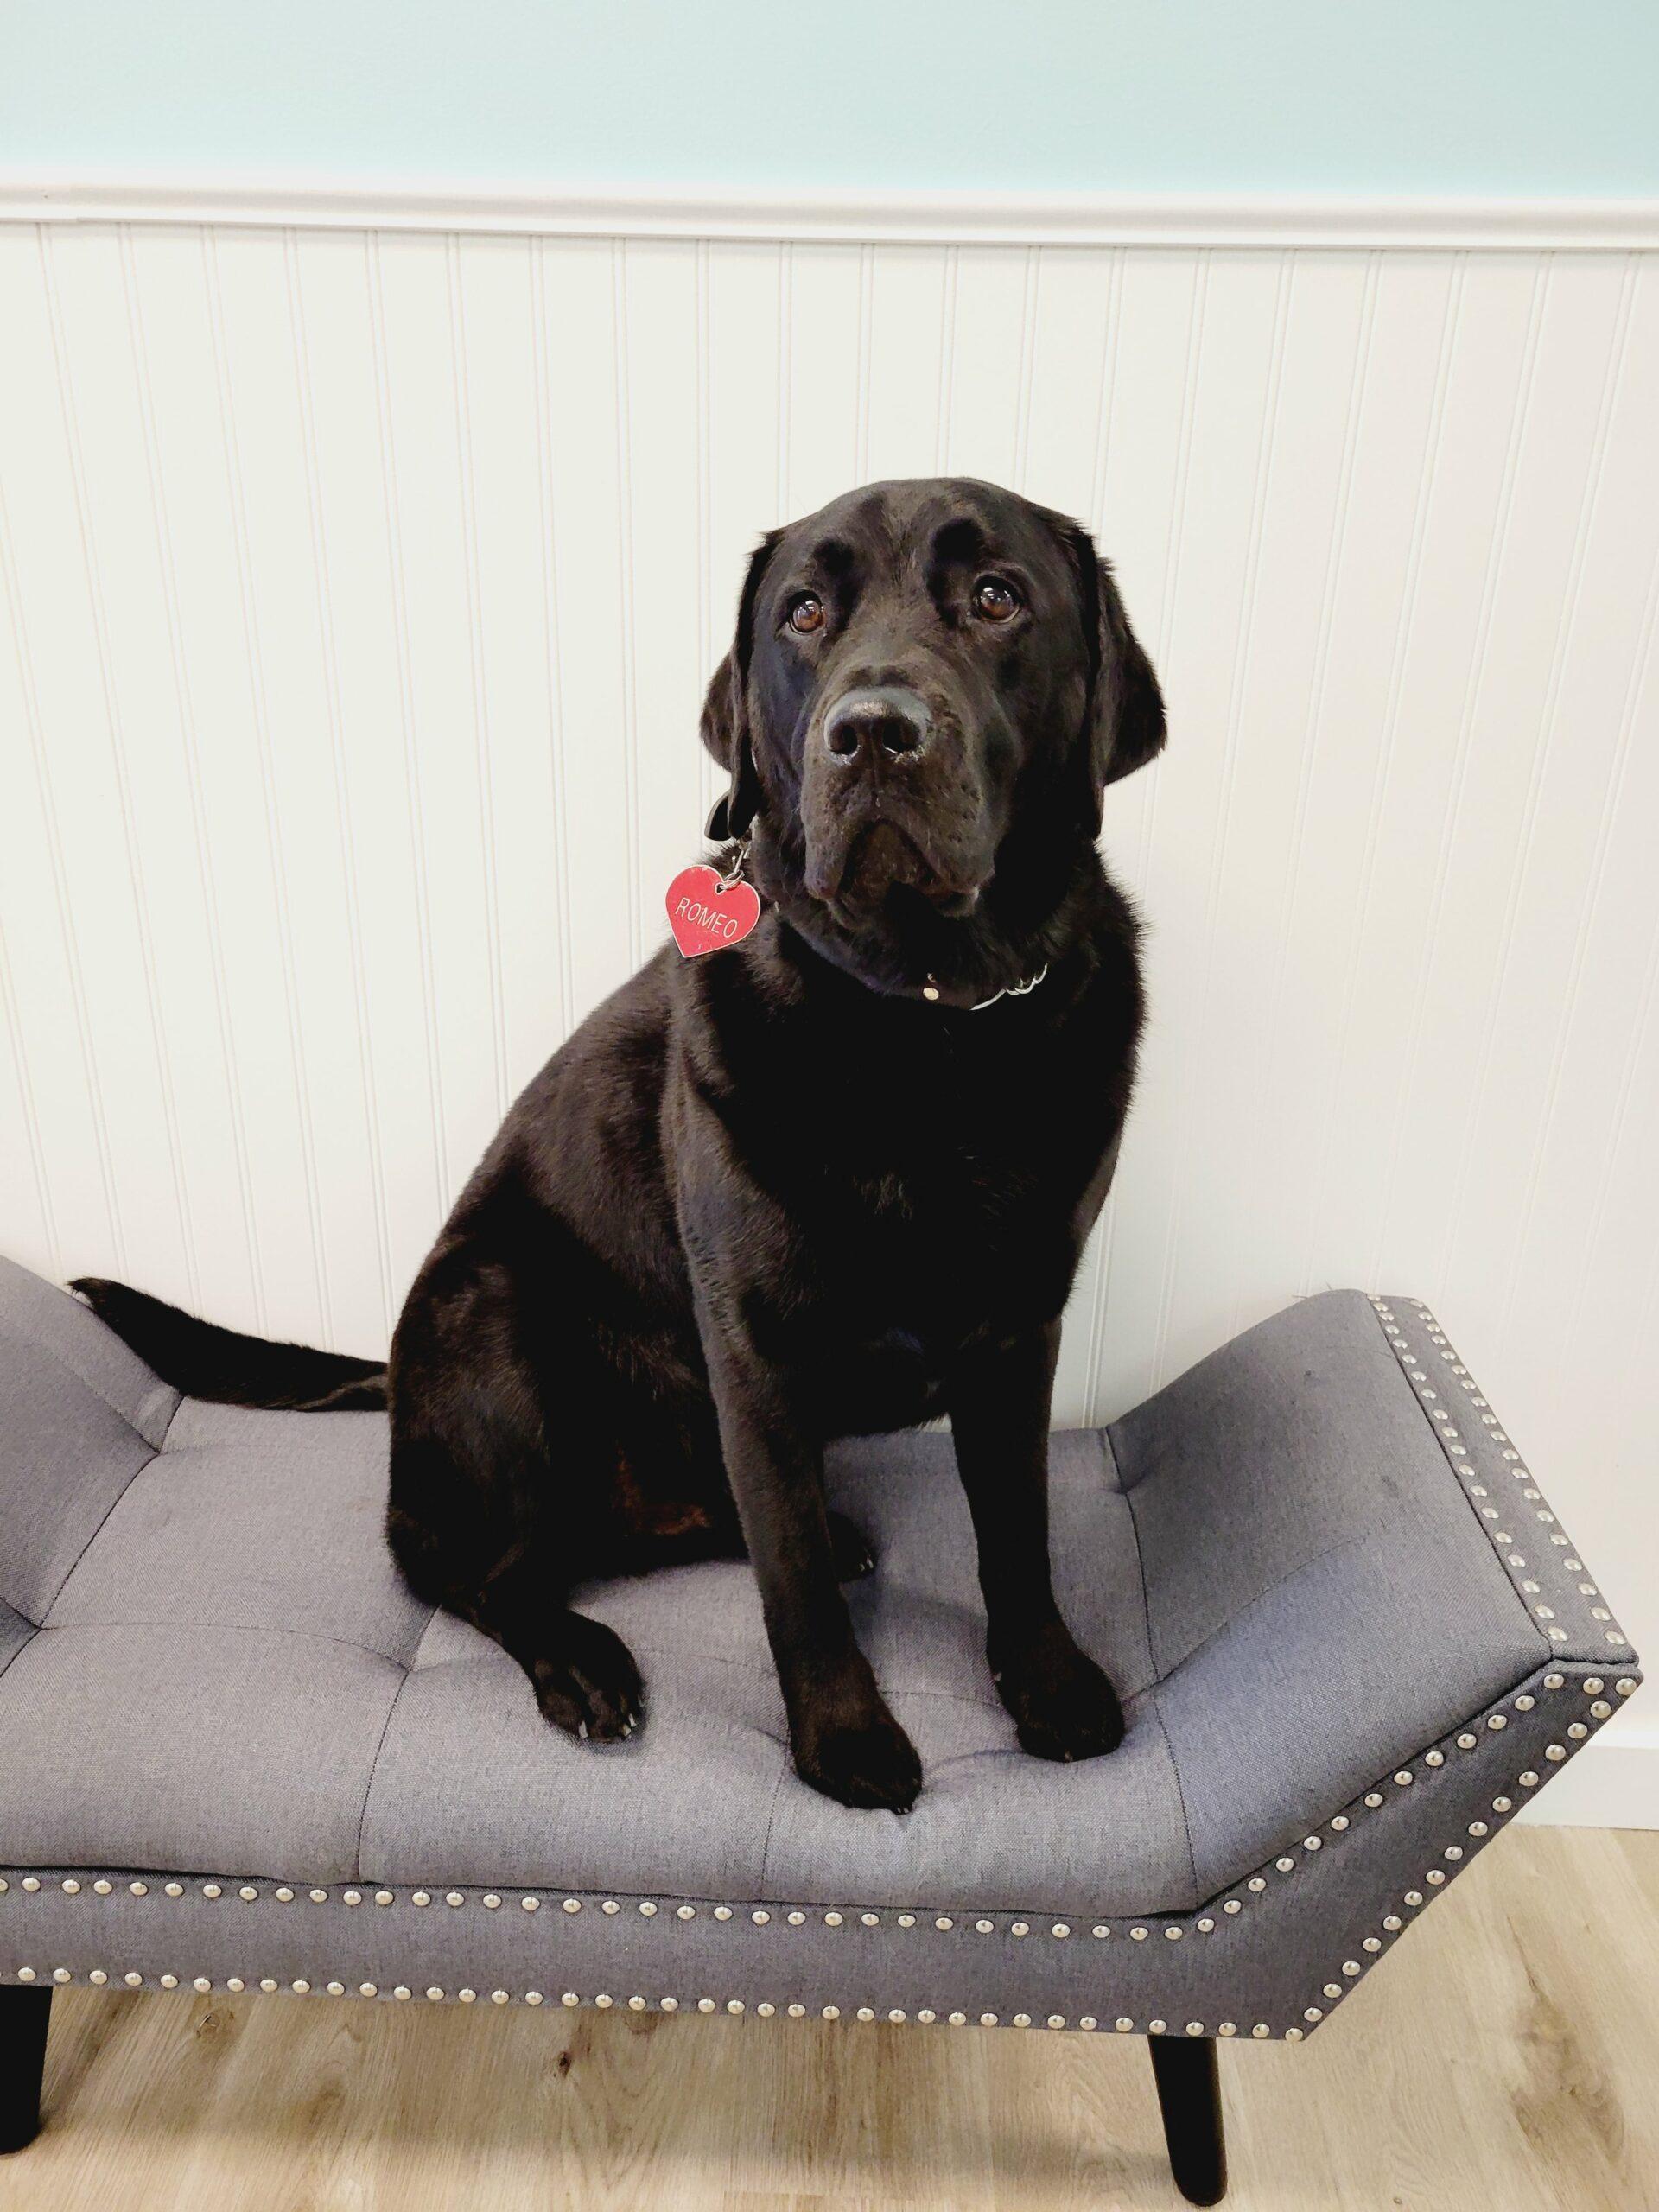 Le Patou Canine Salon, Harbor Springs, MI